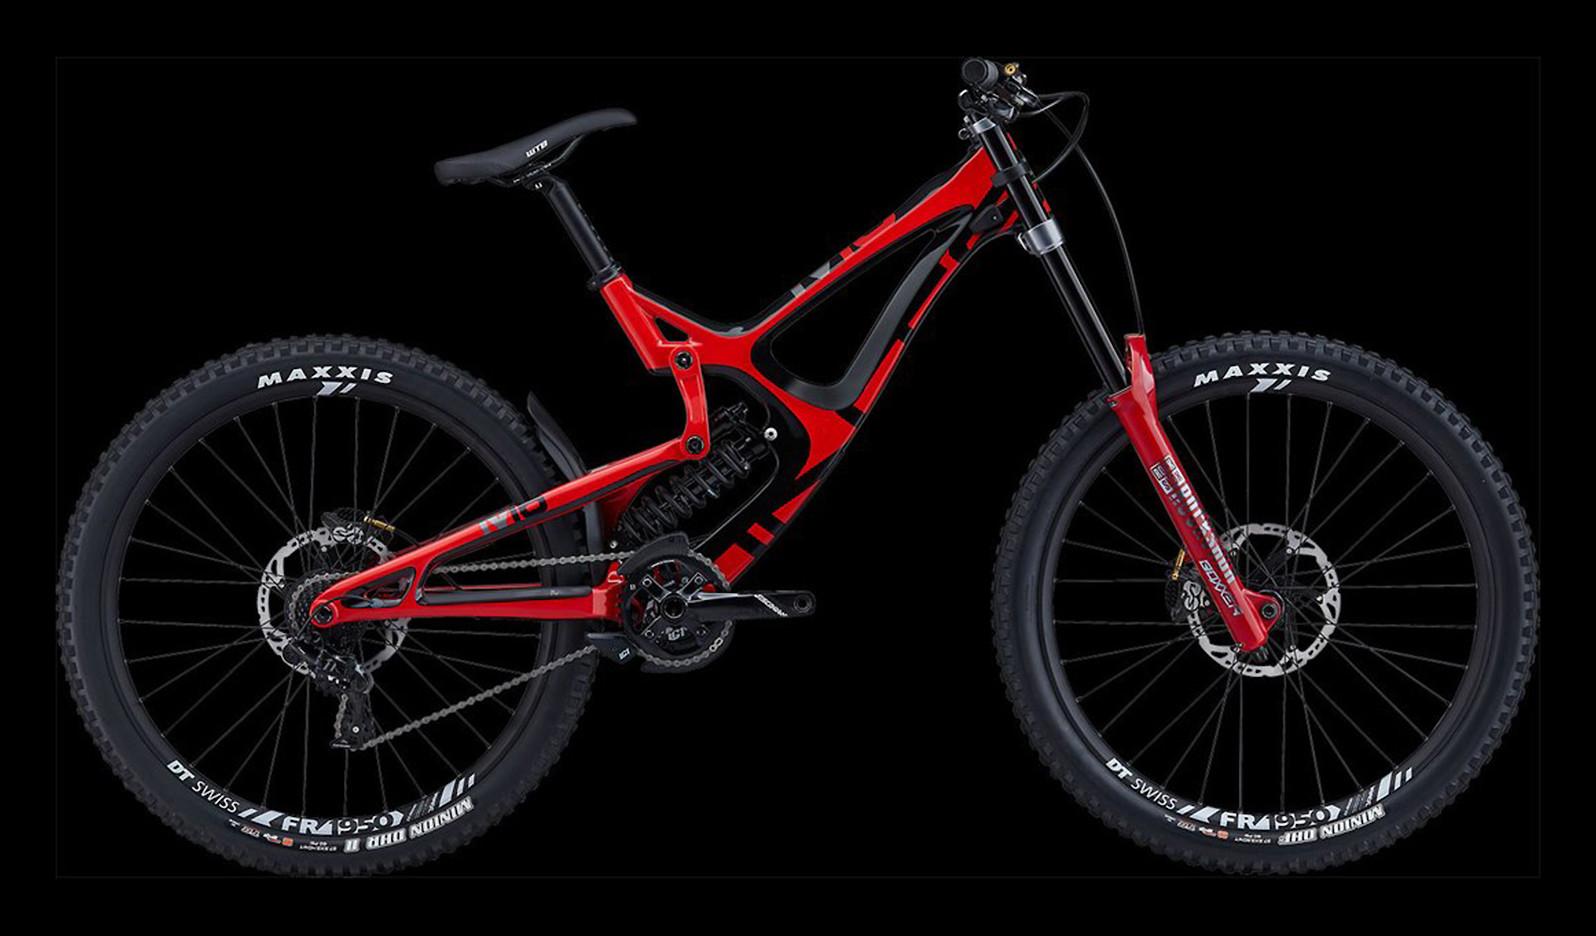 2019 Intense M16 Pro Bike